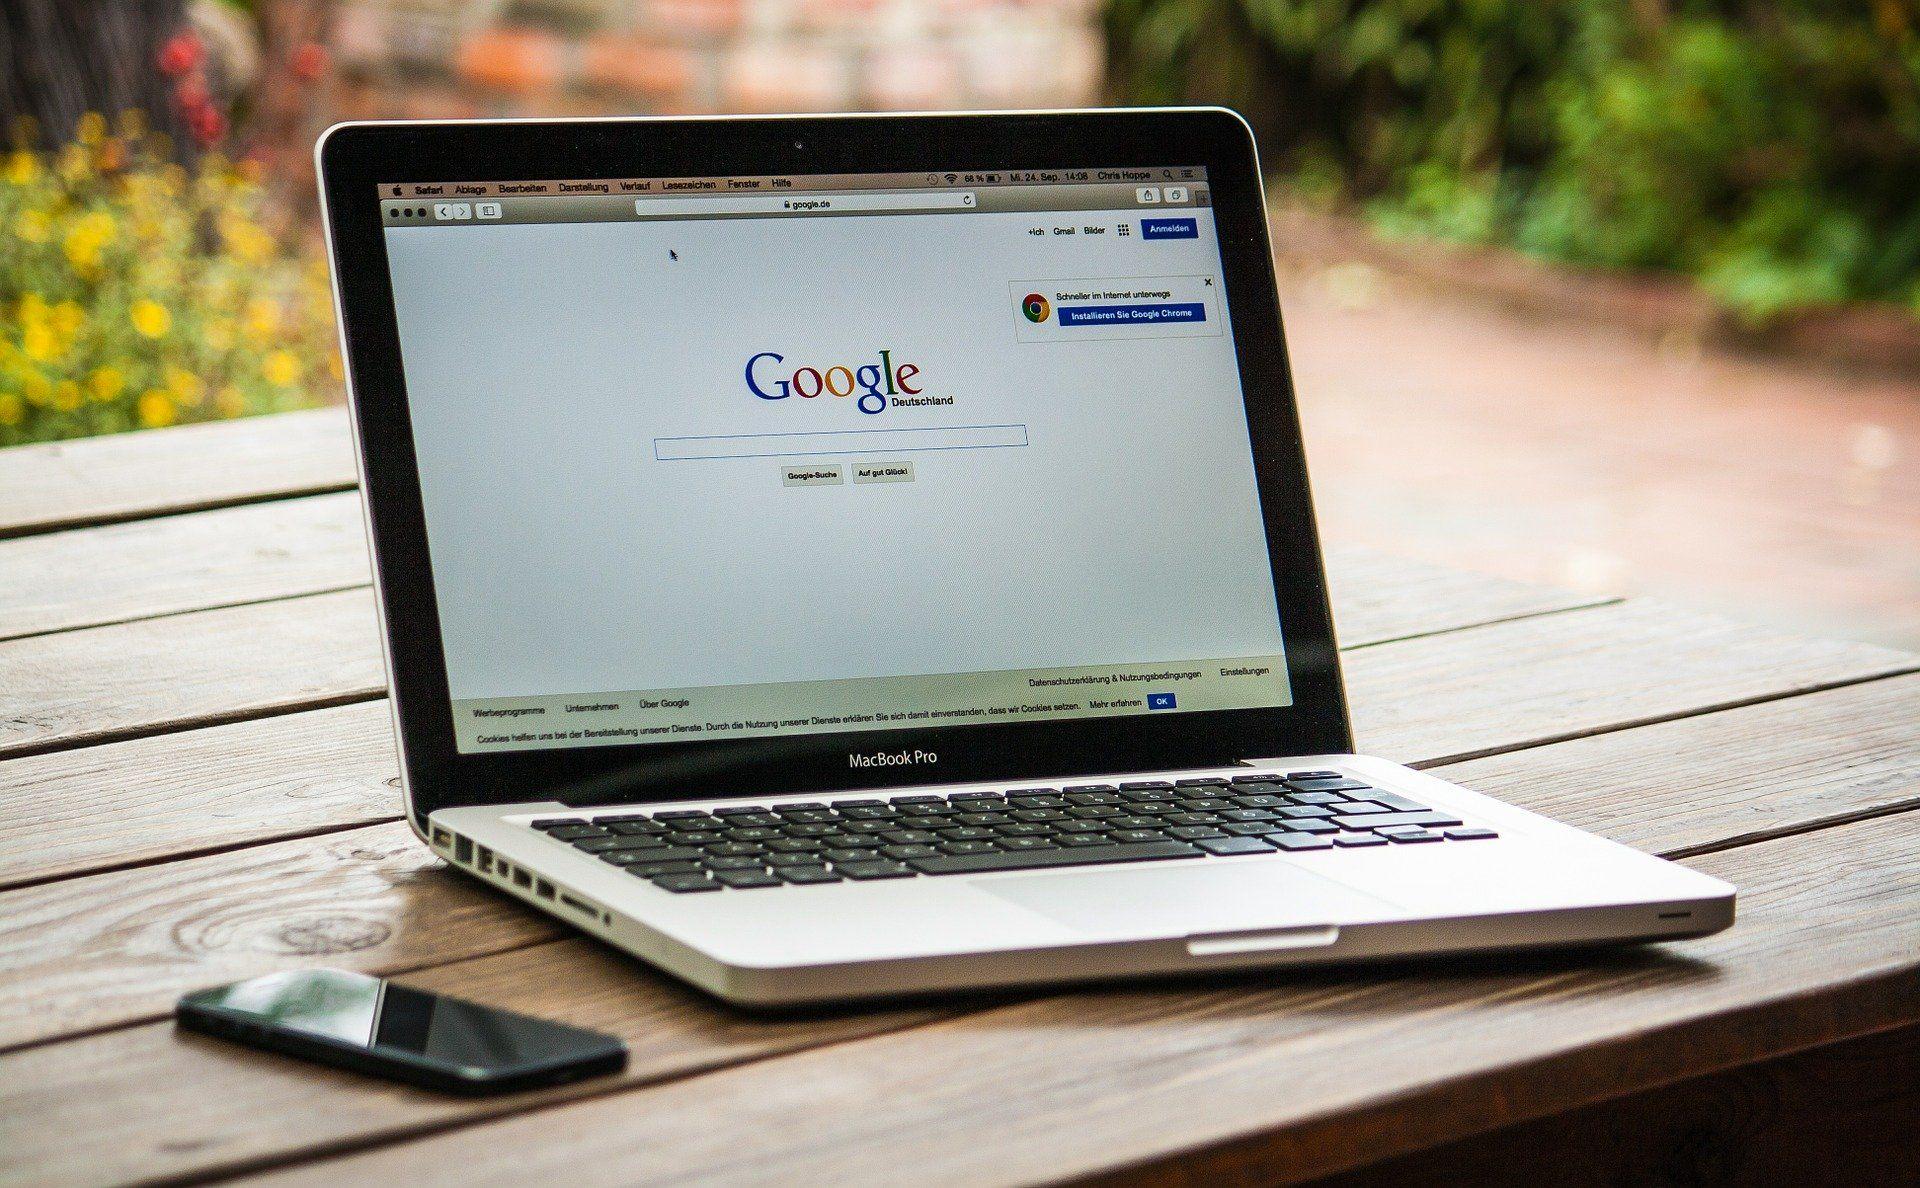 google on a macbook